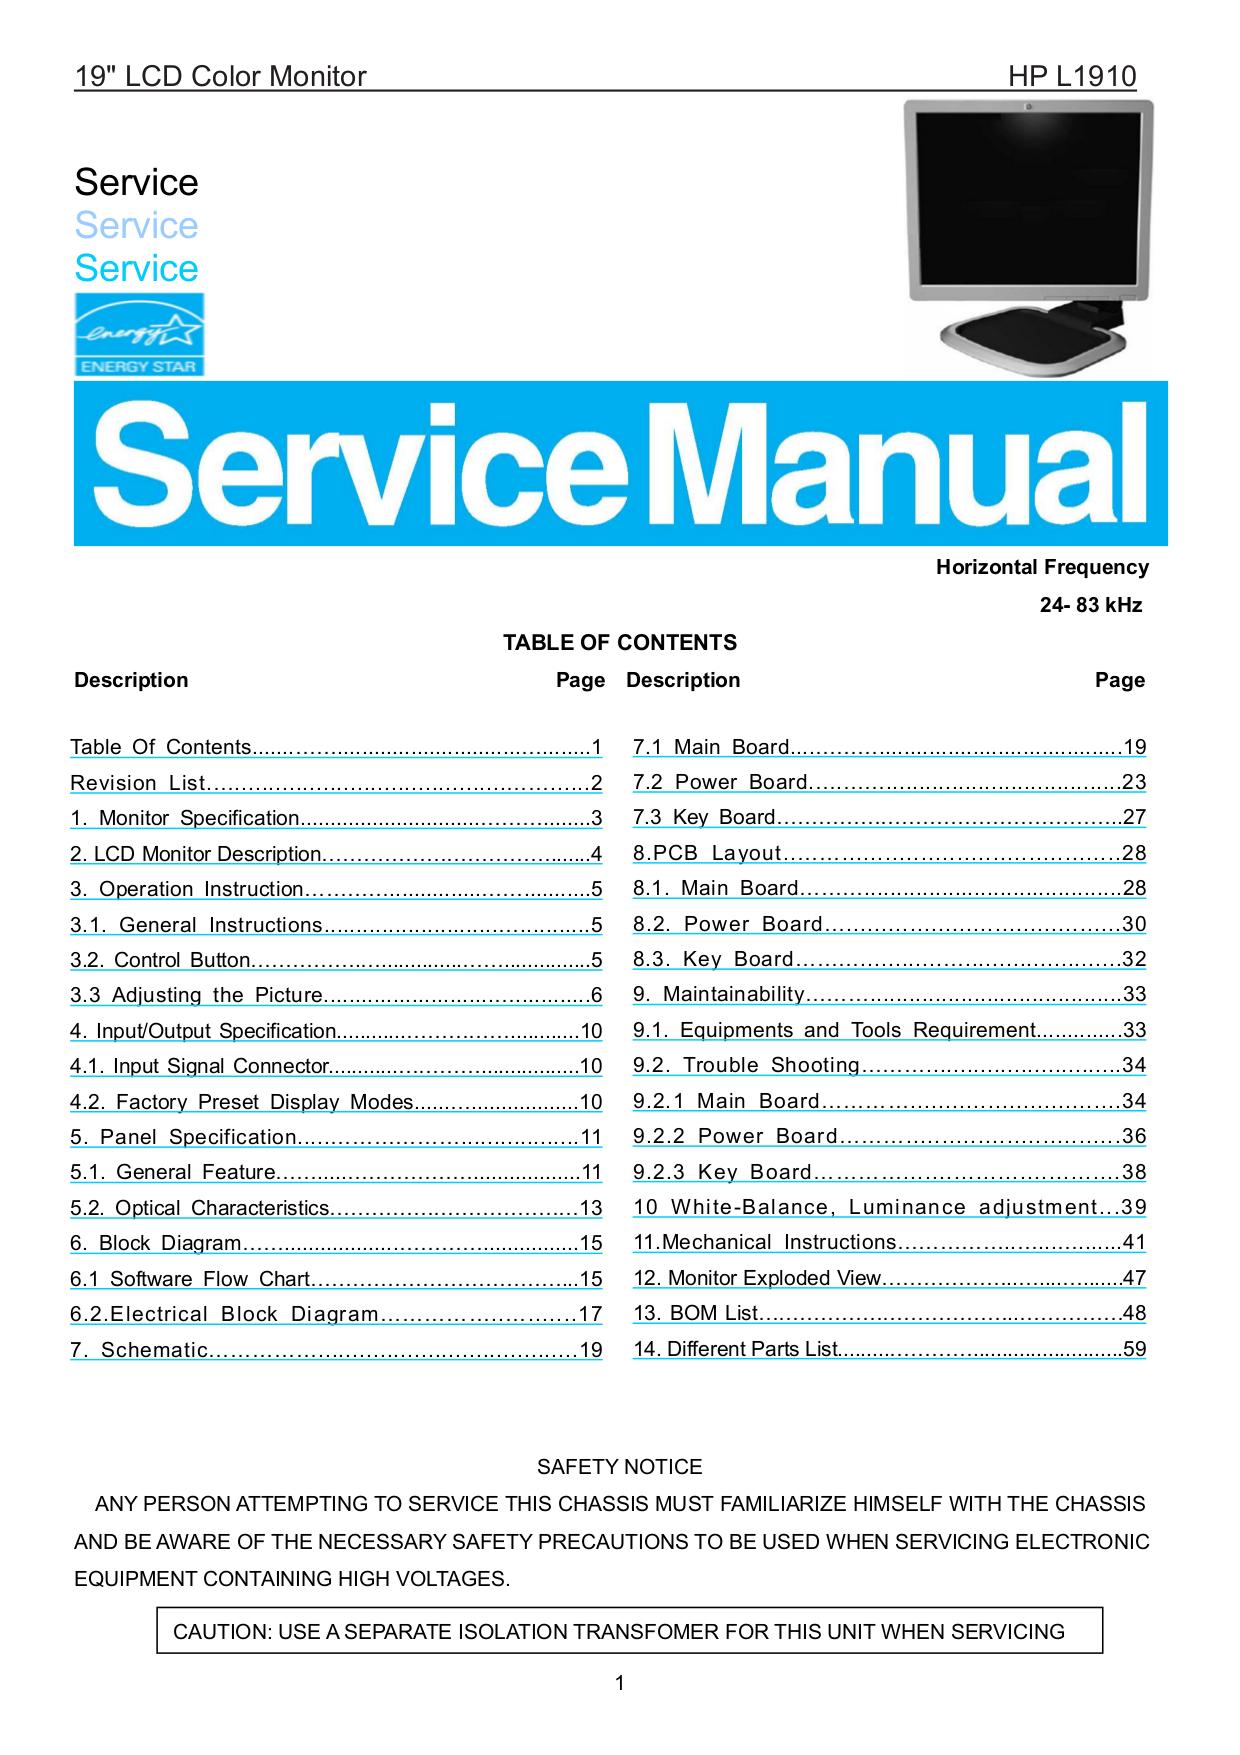 Download Free Pdf For Hp L1910 Monitor Manual